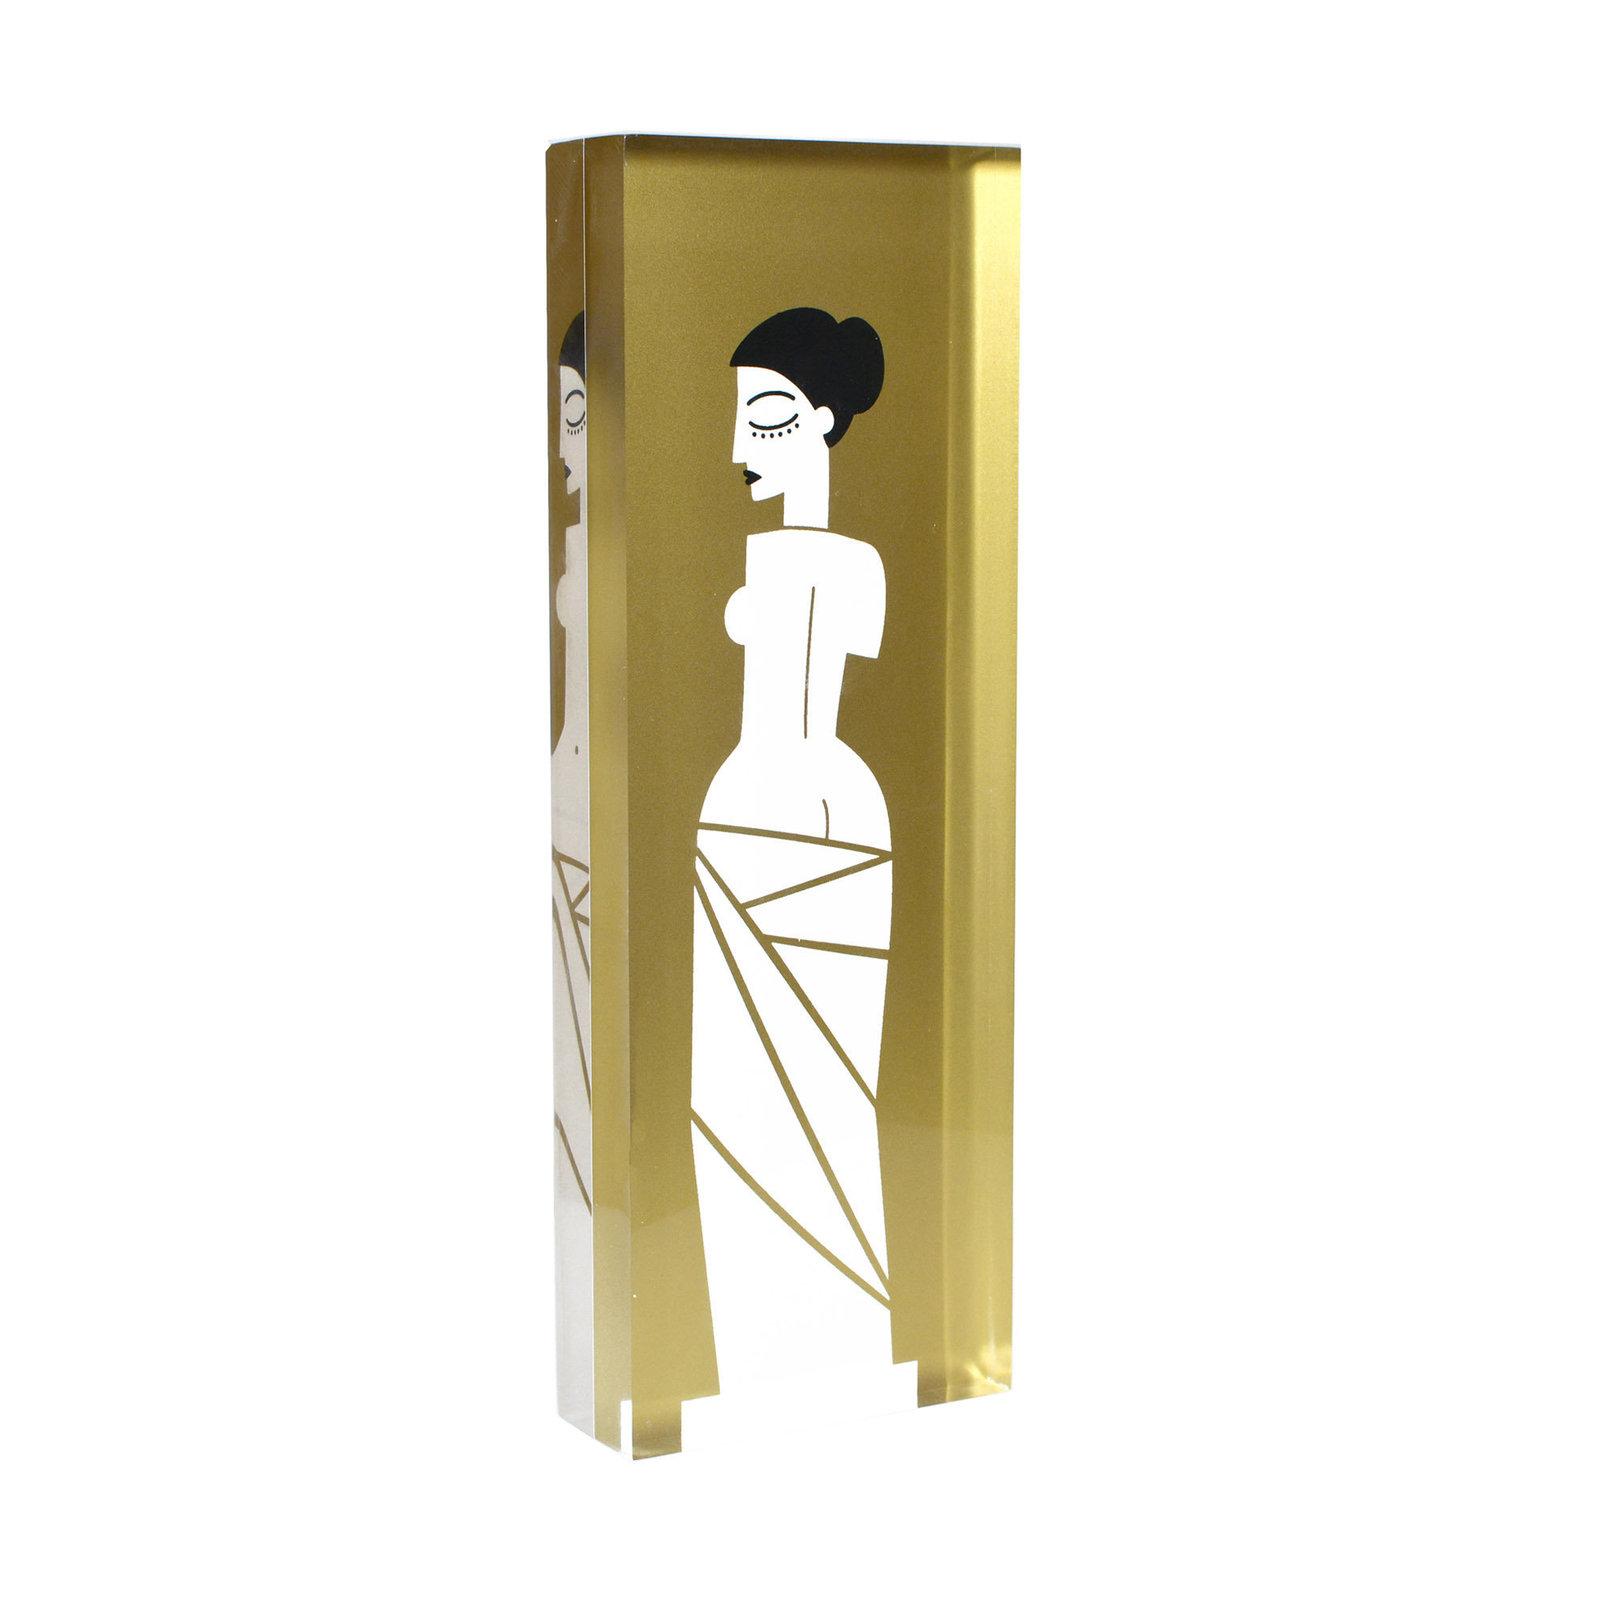 GRACIOUS GREECE Aphrodite Gold Design Object Greek Statue Home Decor - $100.00